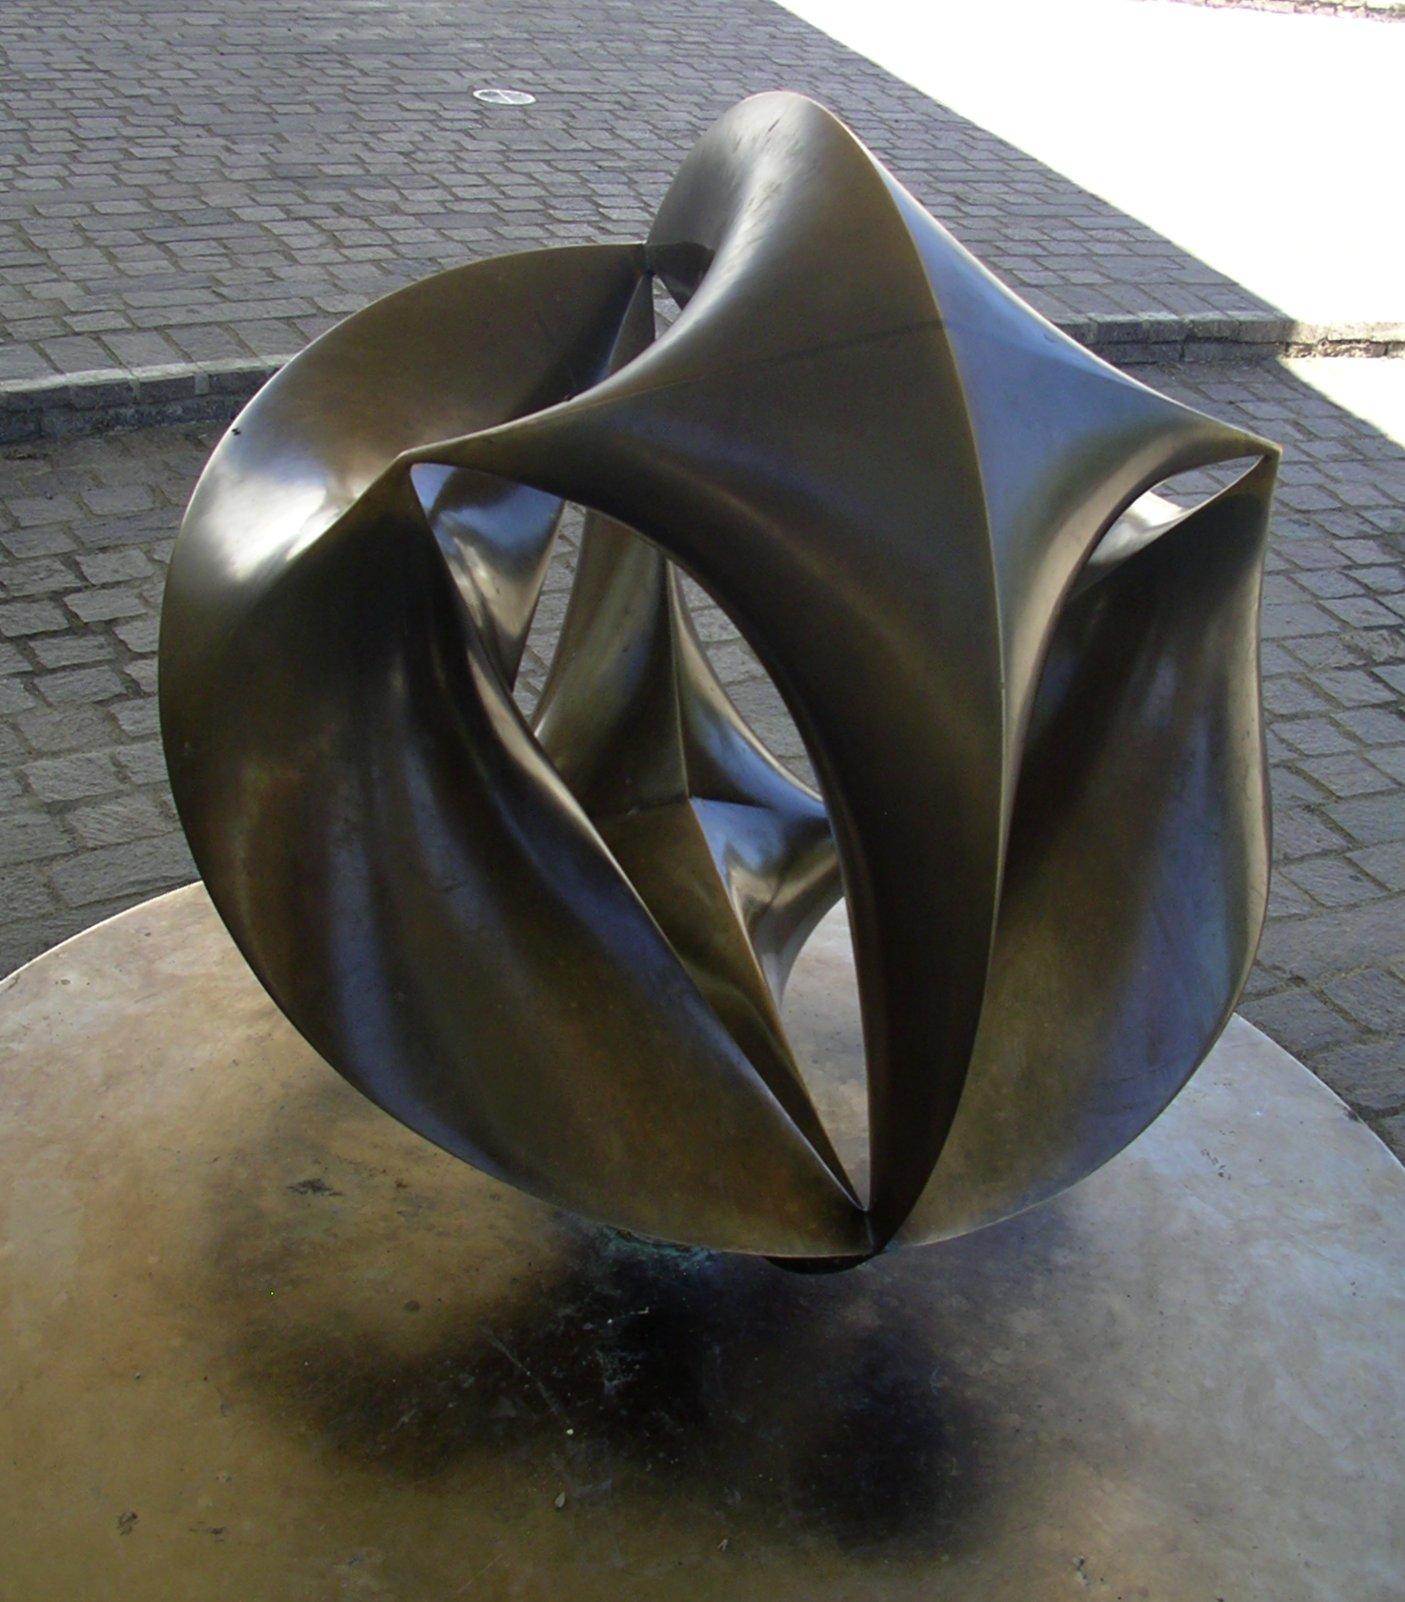 Vajarstvo-skulpture - Page 6 4892893234_2b0feb9bb6_o